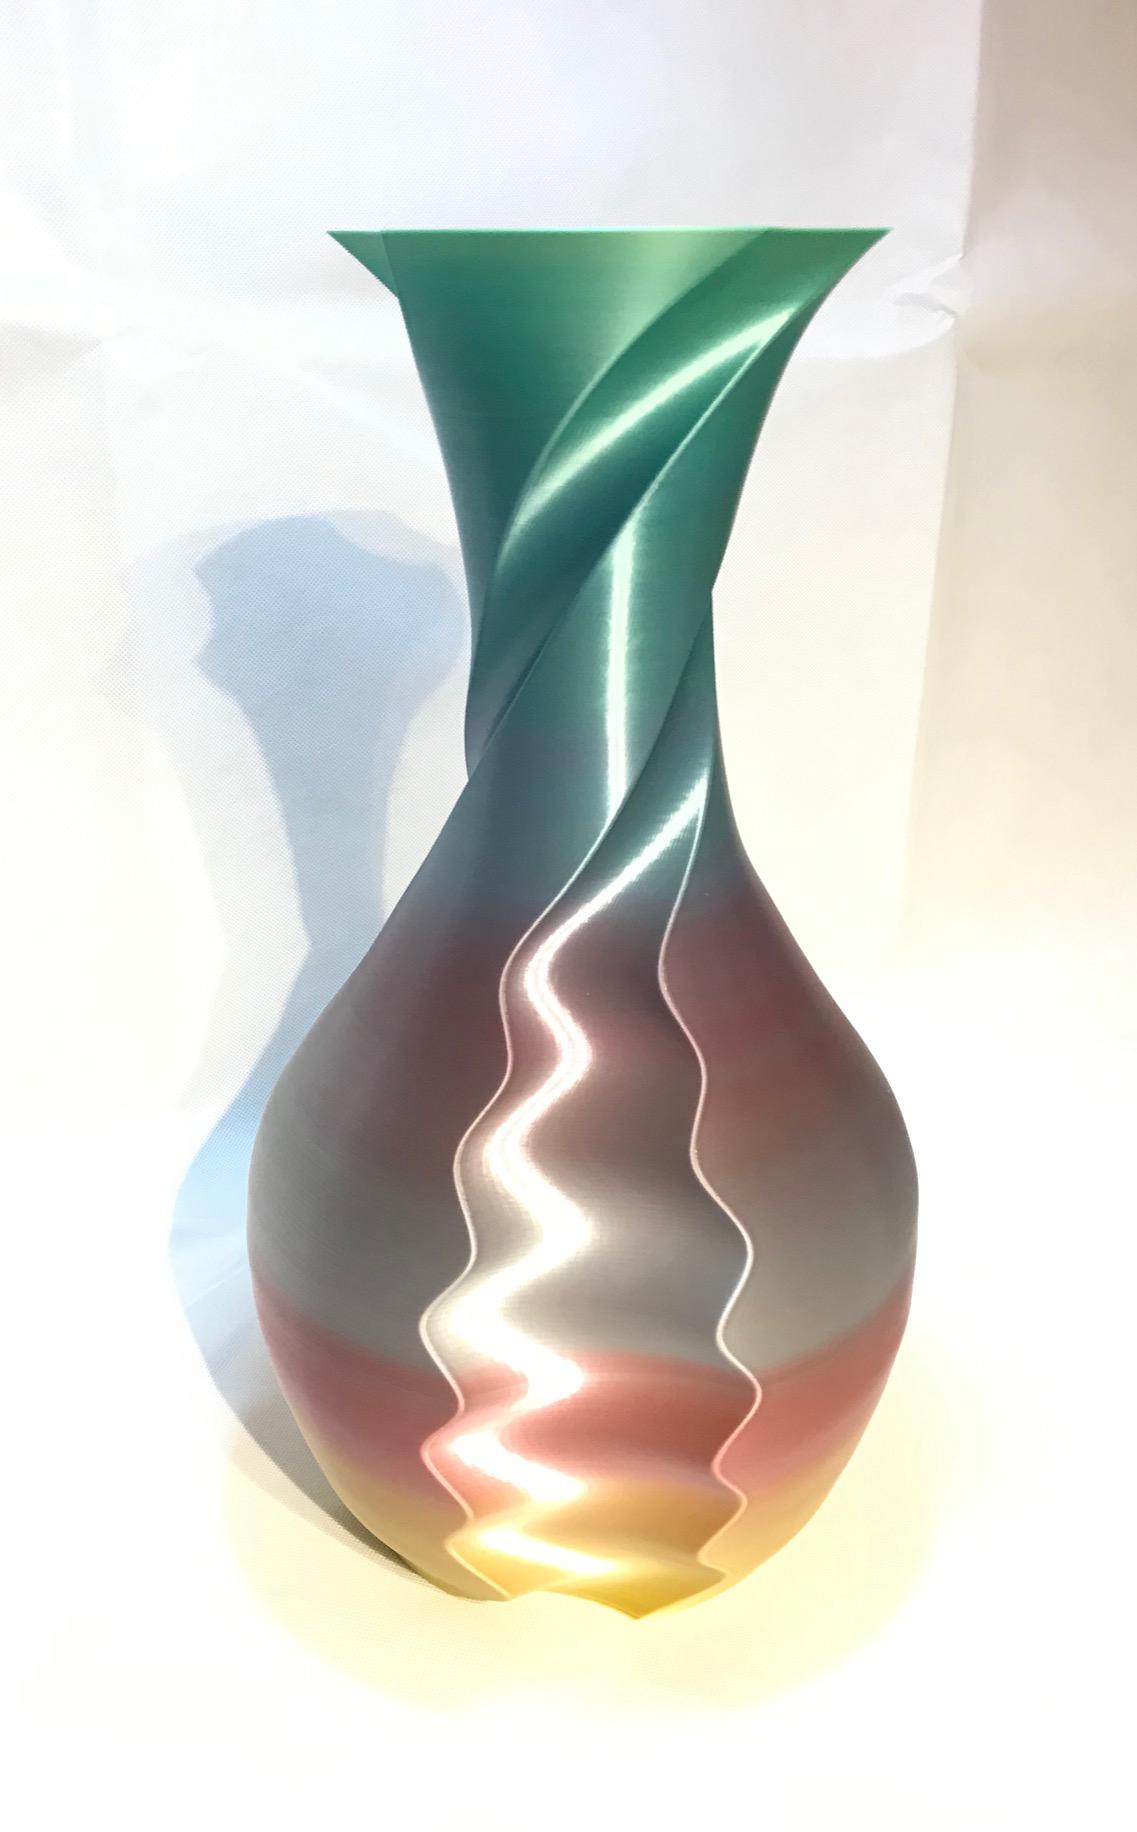 IMG_5310.jpg Download free STL file Shake & twist vase • 3D printable design, Brithawkes